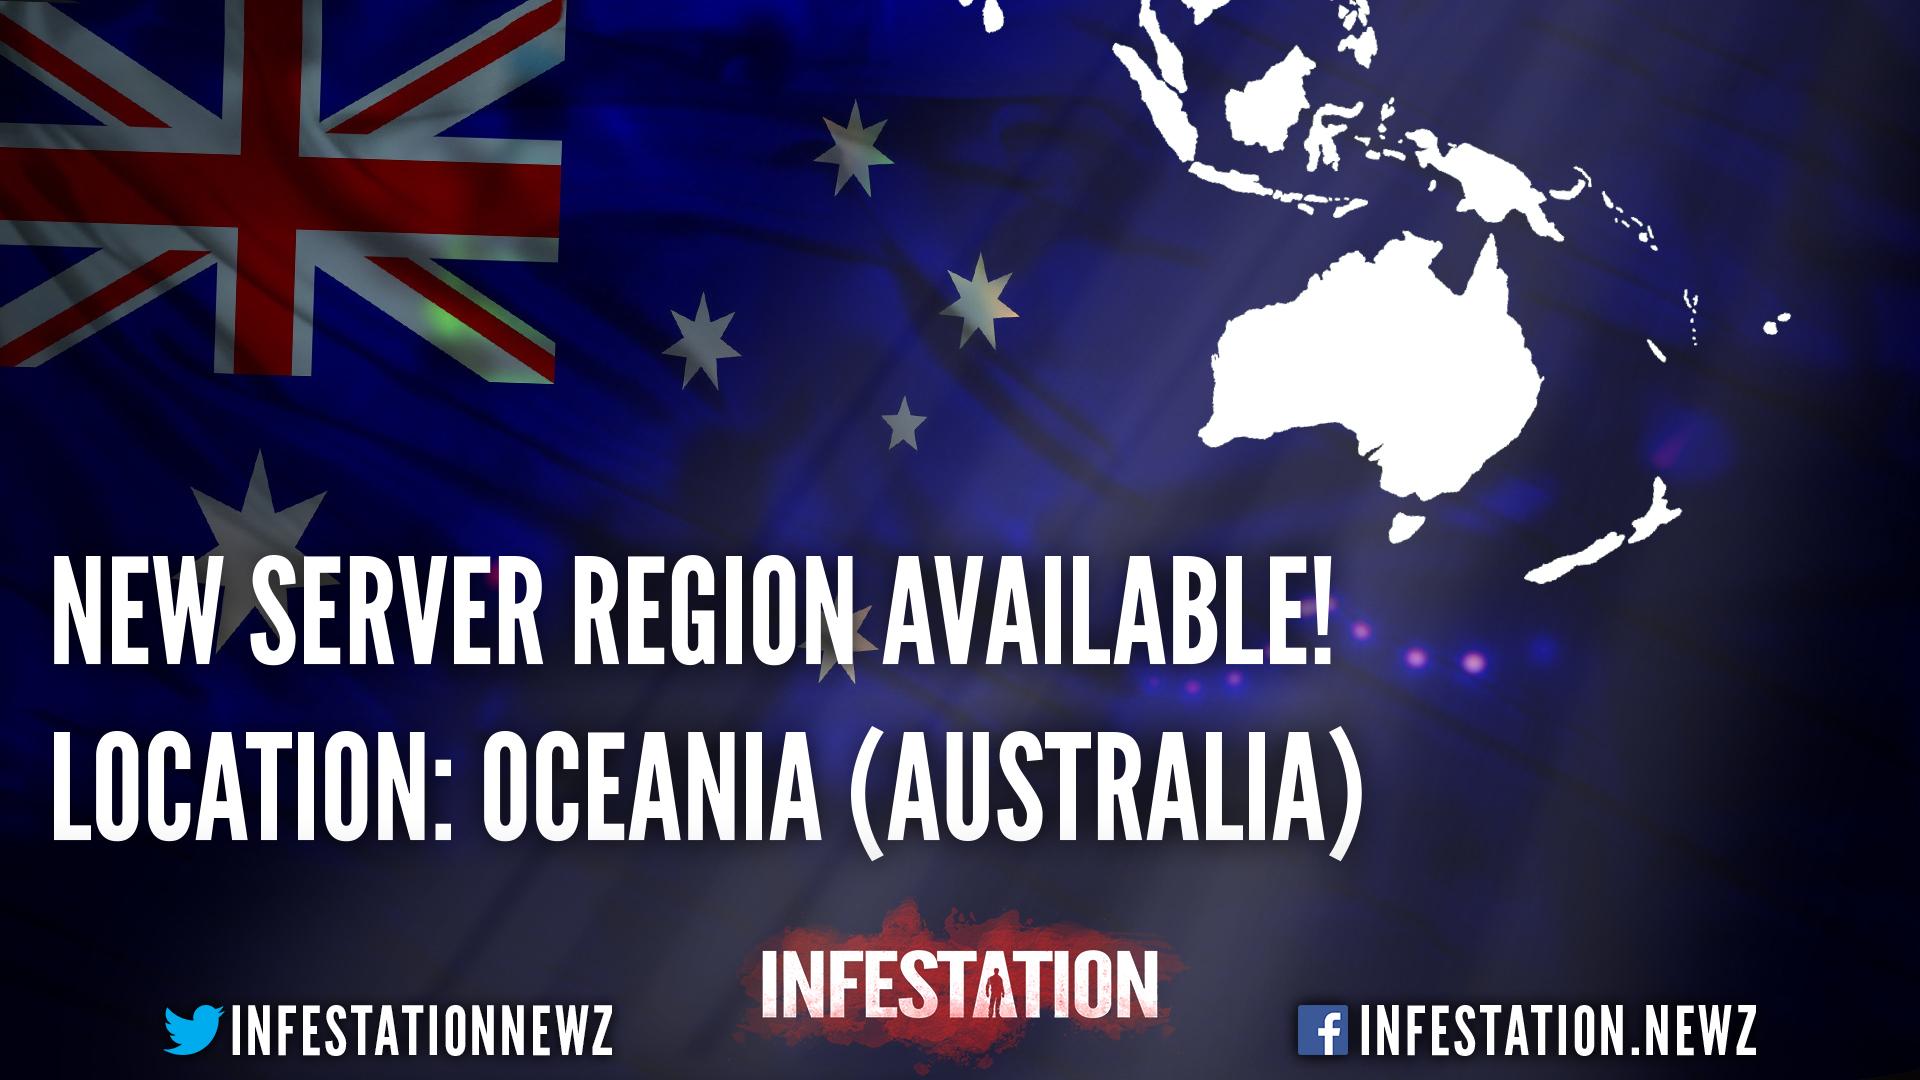 New Region - OCEANIA